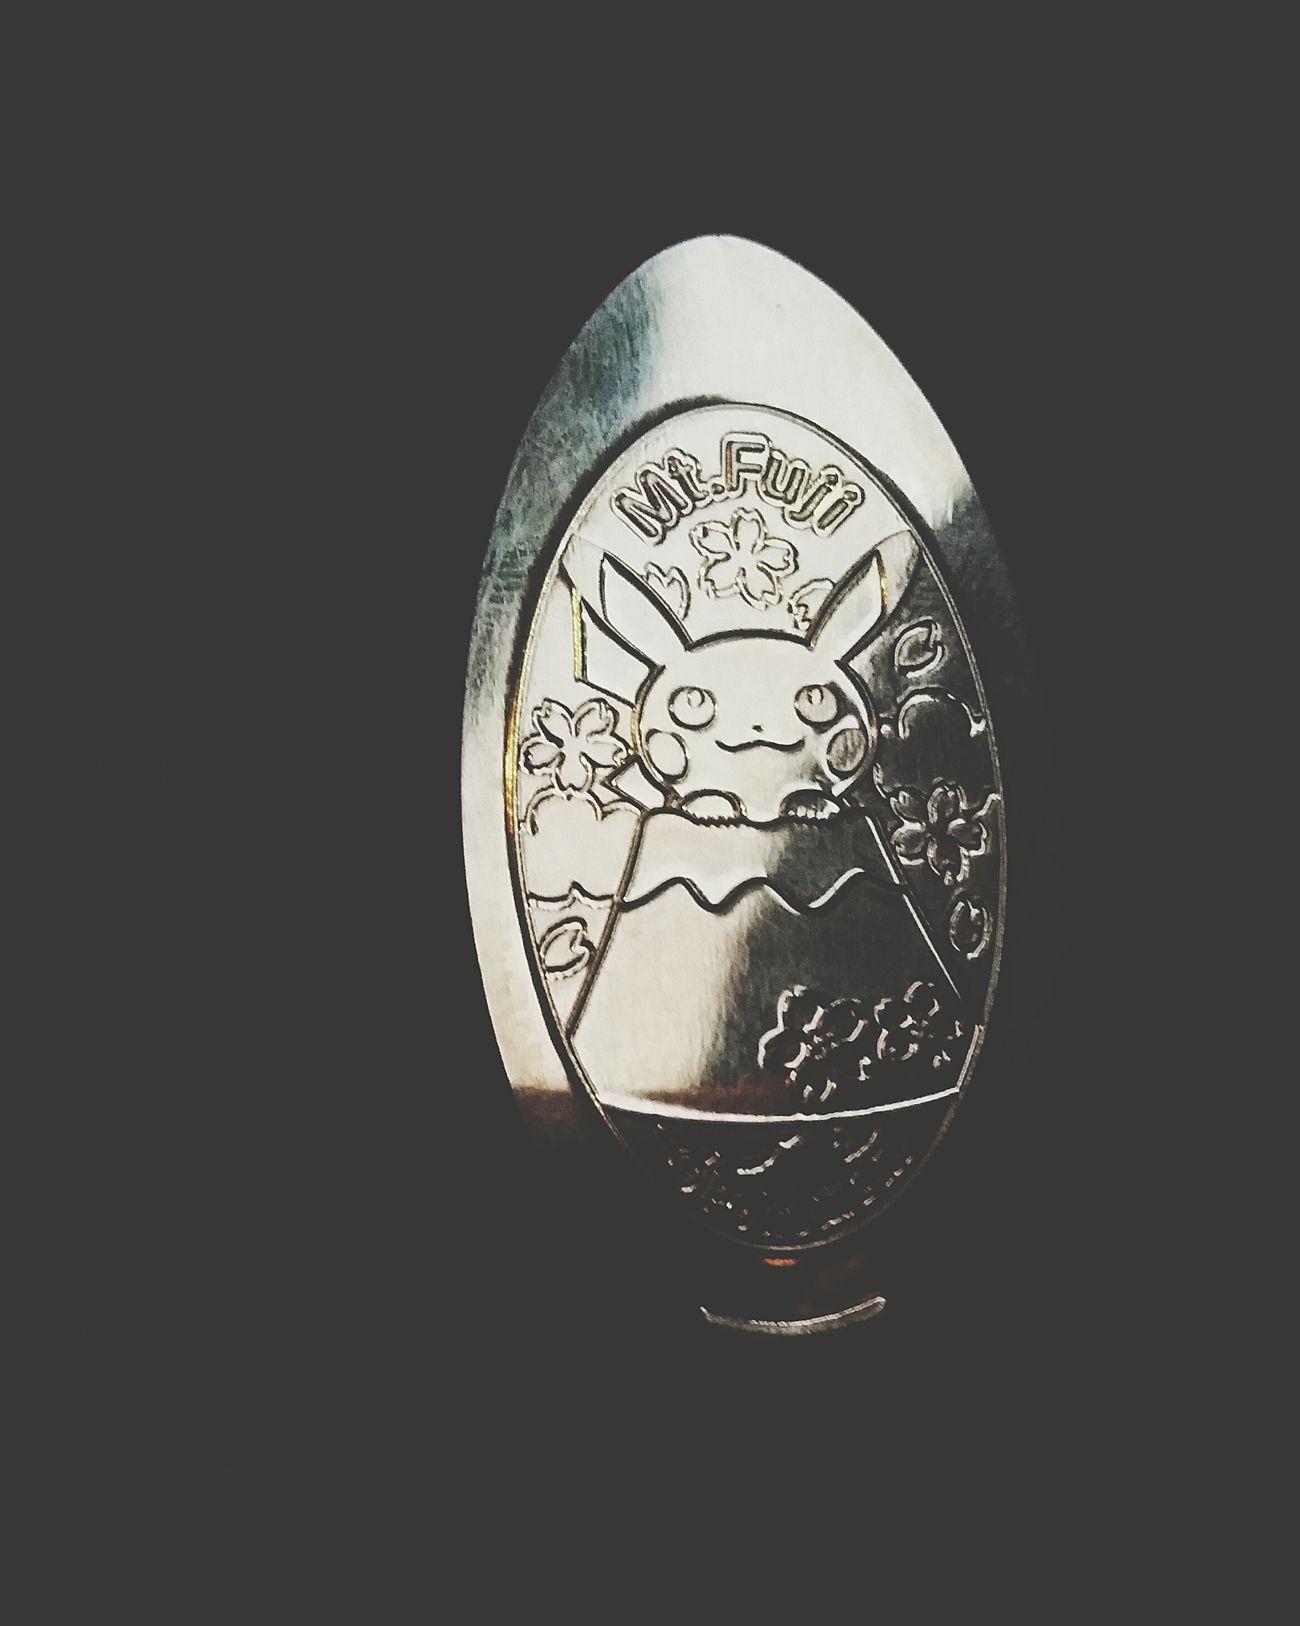 Pikachu Mount FuJi Coin Stamp Shizuoka,japan Japan Winter2016 JapanDec2016